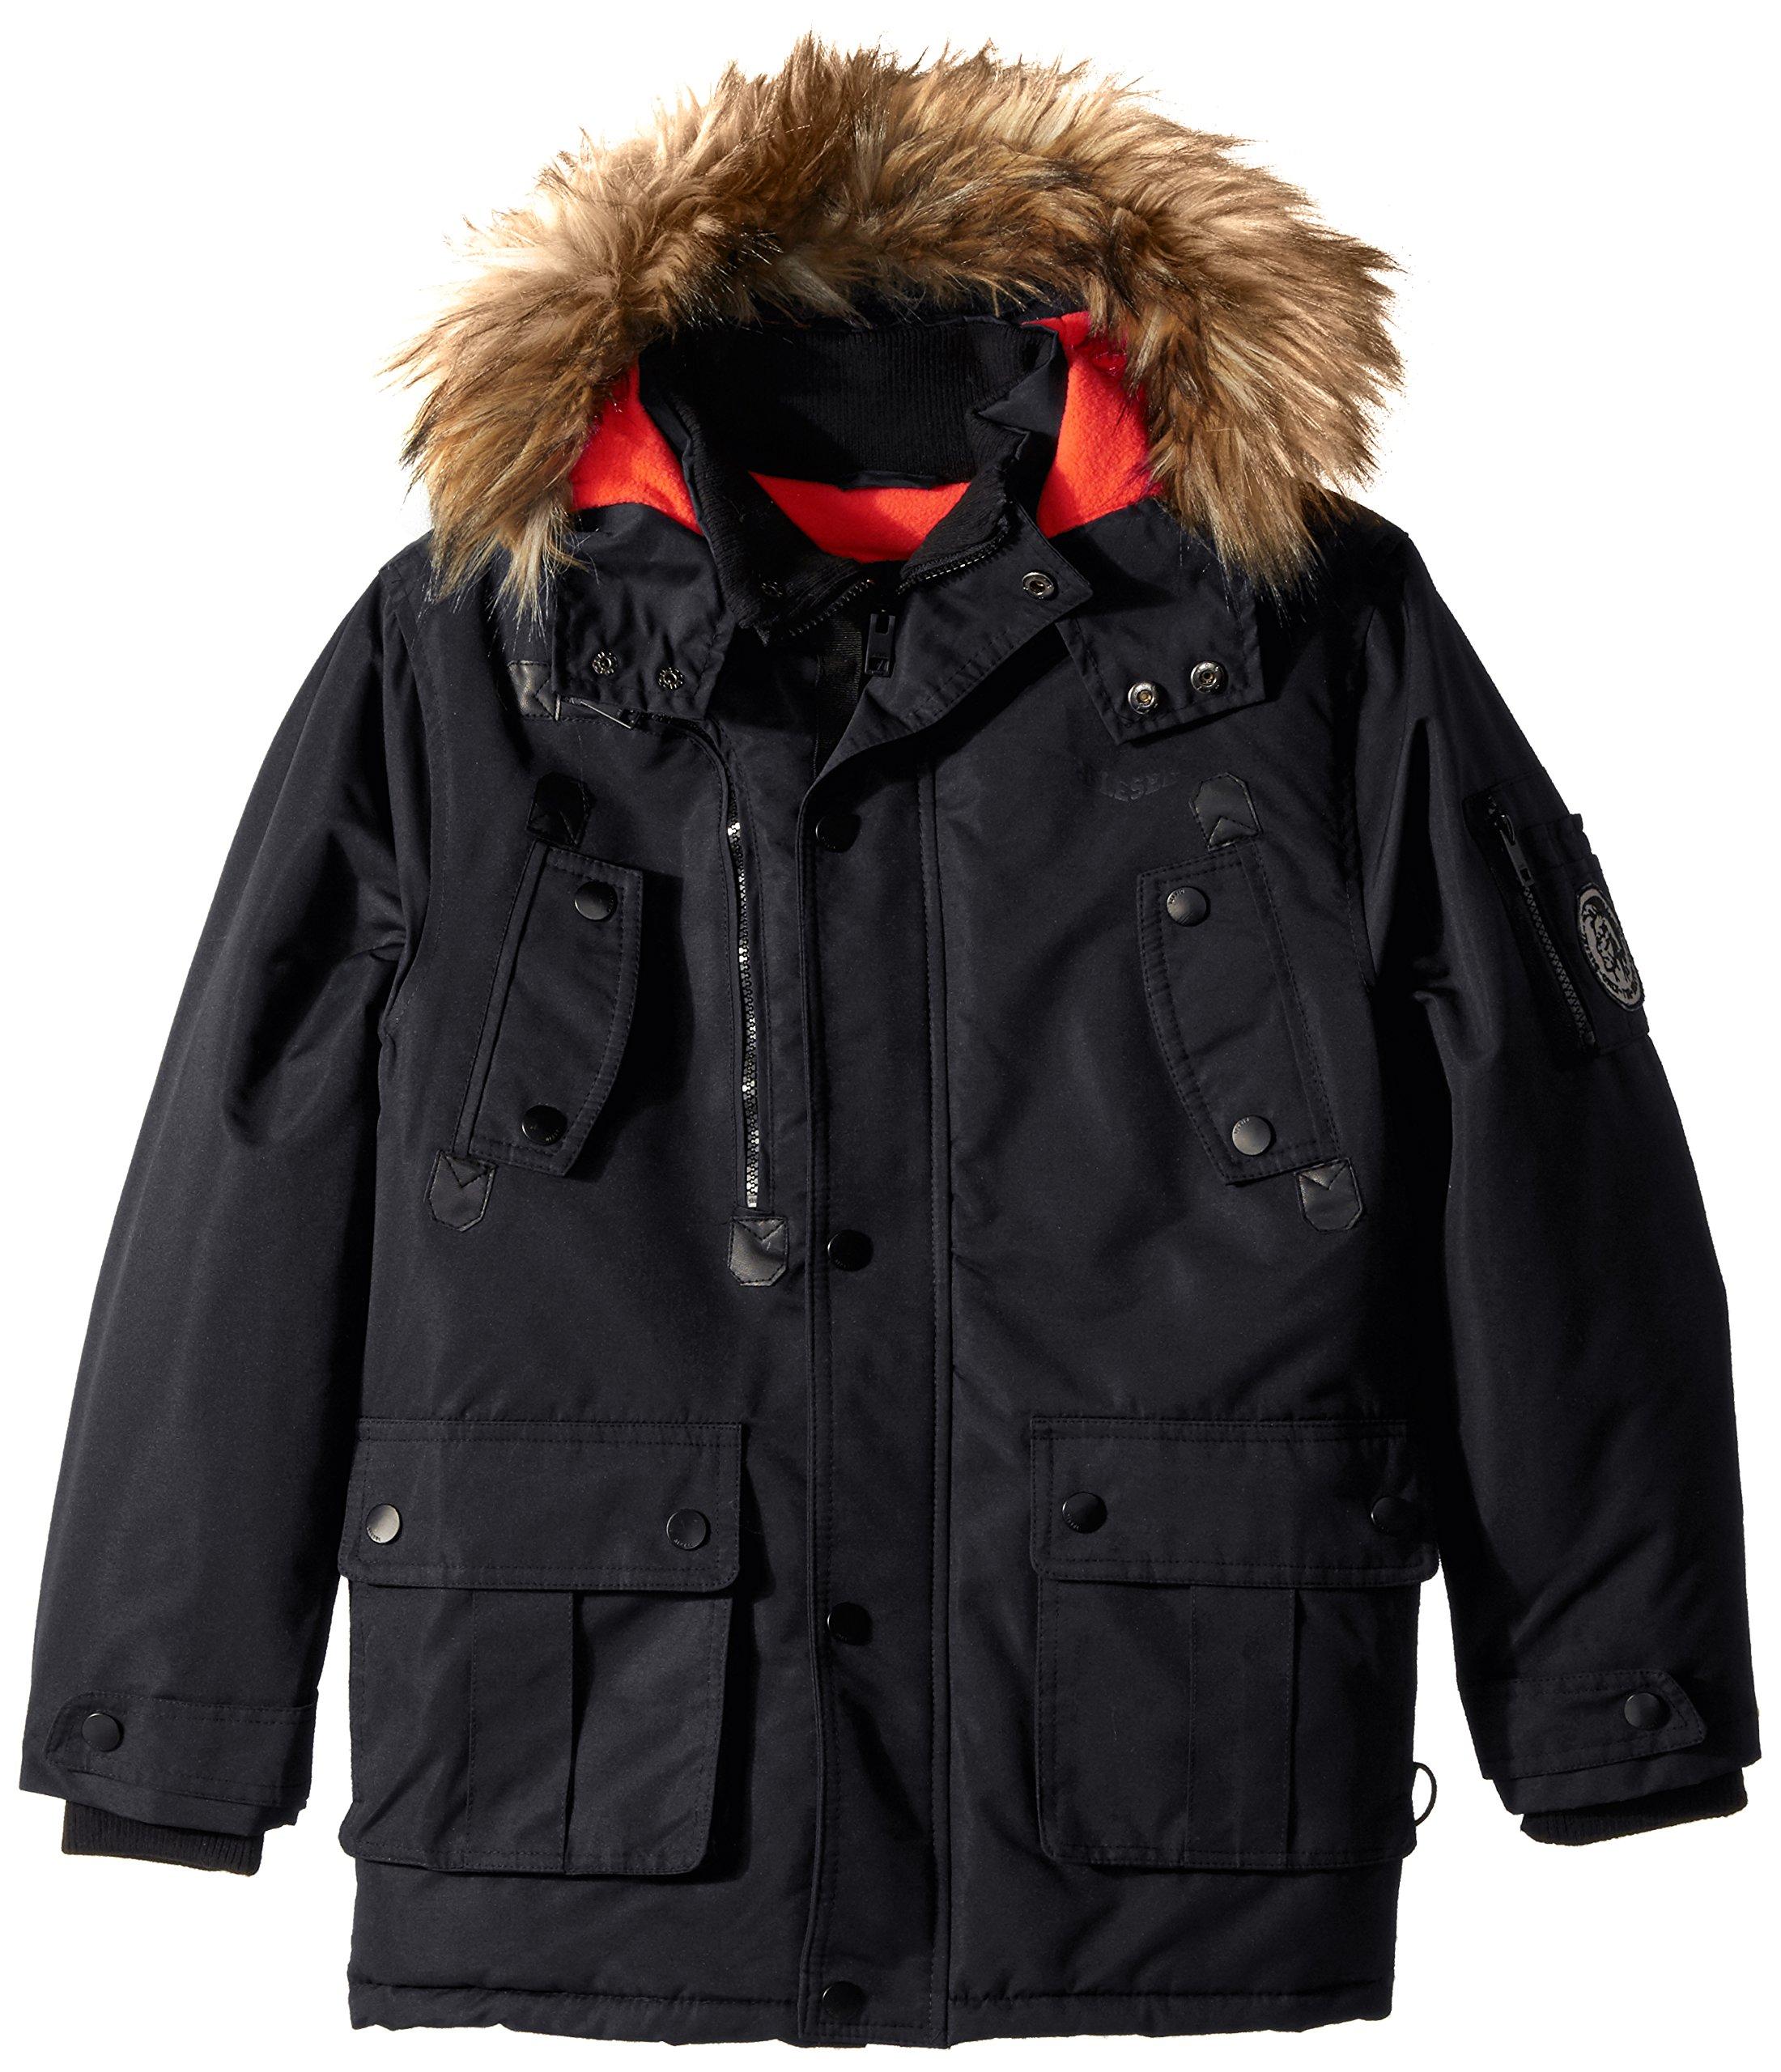 Diesel Boys' Little Outerwear Jacket (More Styles Available), Faux Fur Parka-DS68-Black, 7